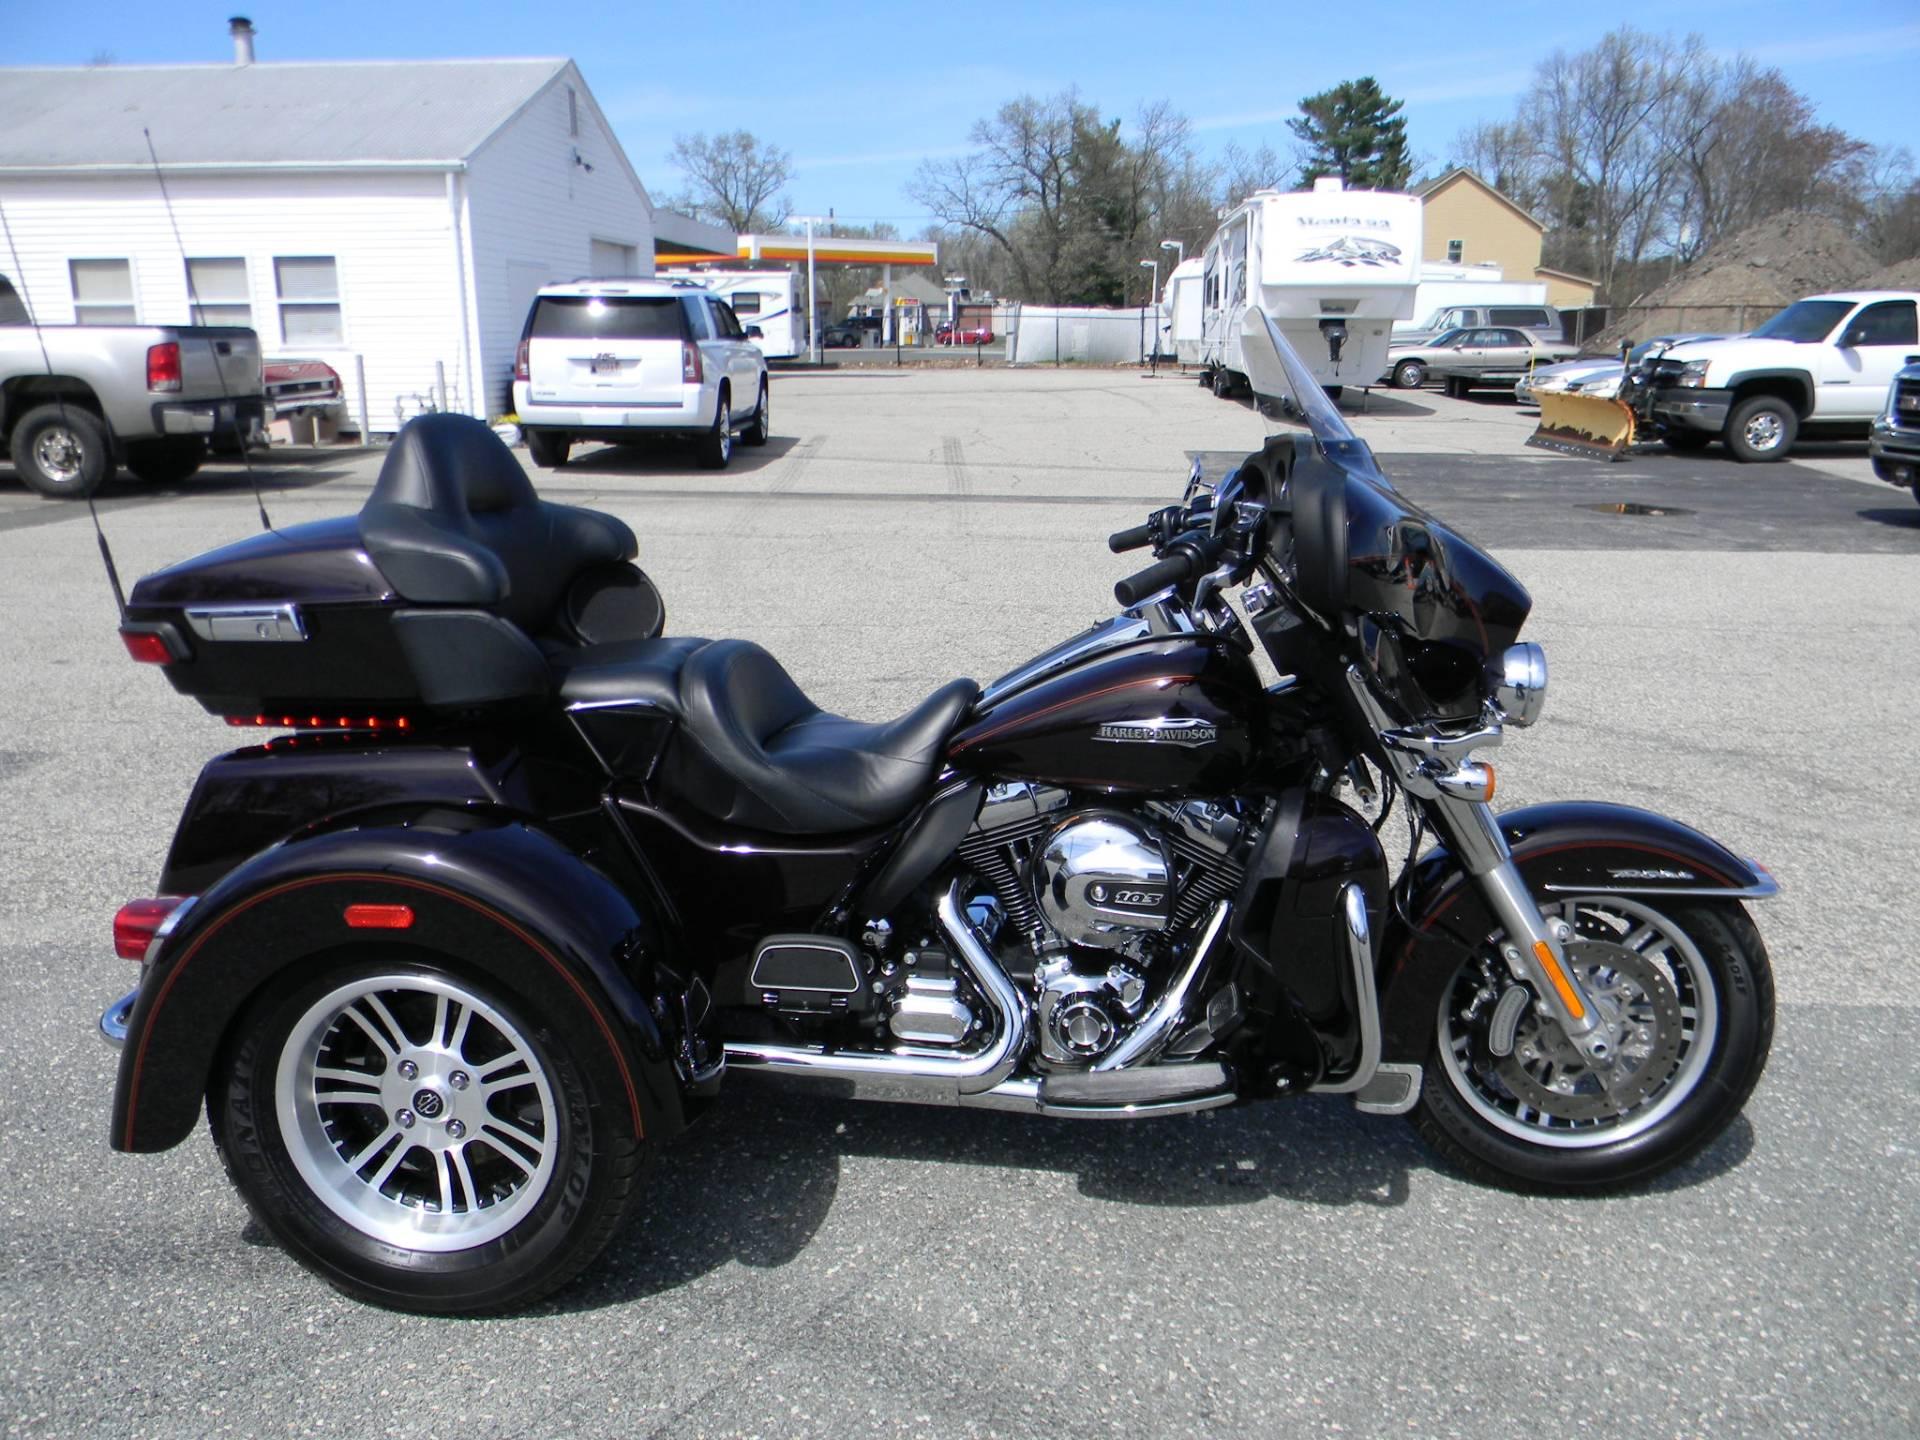 2014 Harley Davidson Tri Glide Ultra: 2014 Harley-Davidson Tri Glide® Ultra Trikes Springfield